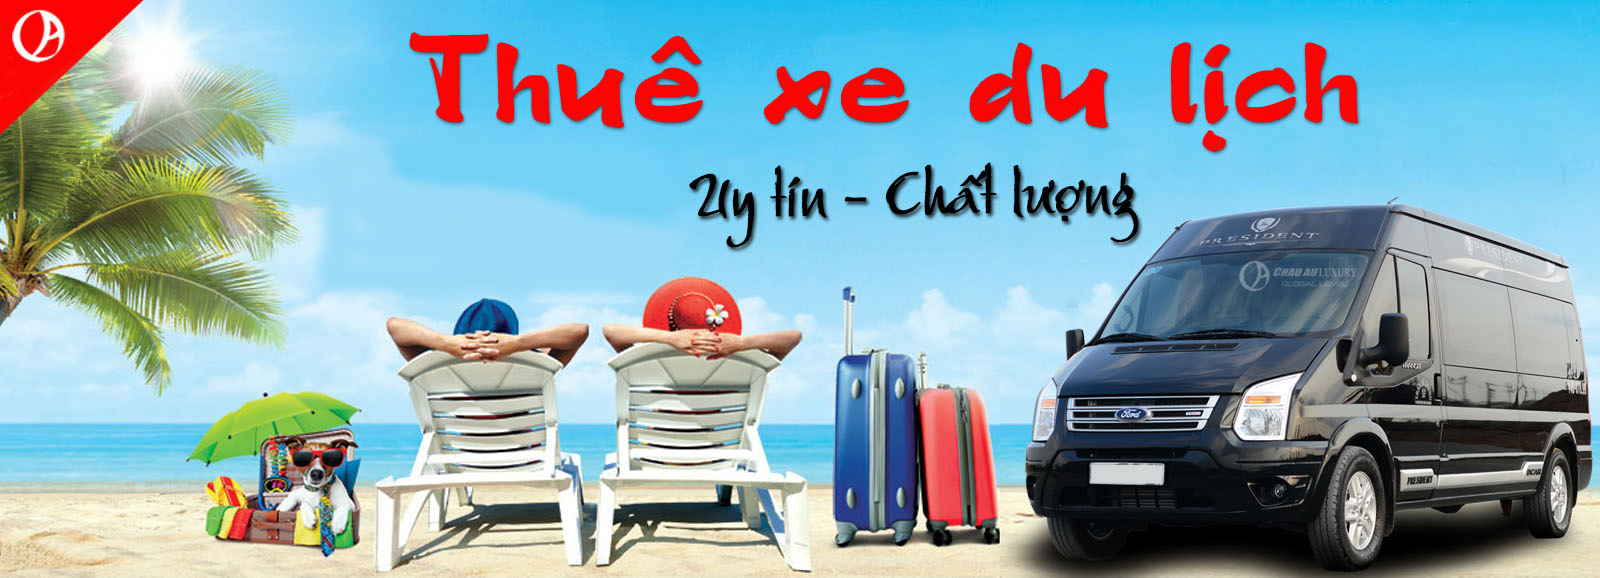 cho-the-xe